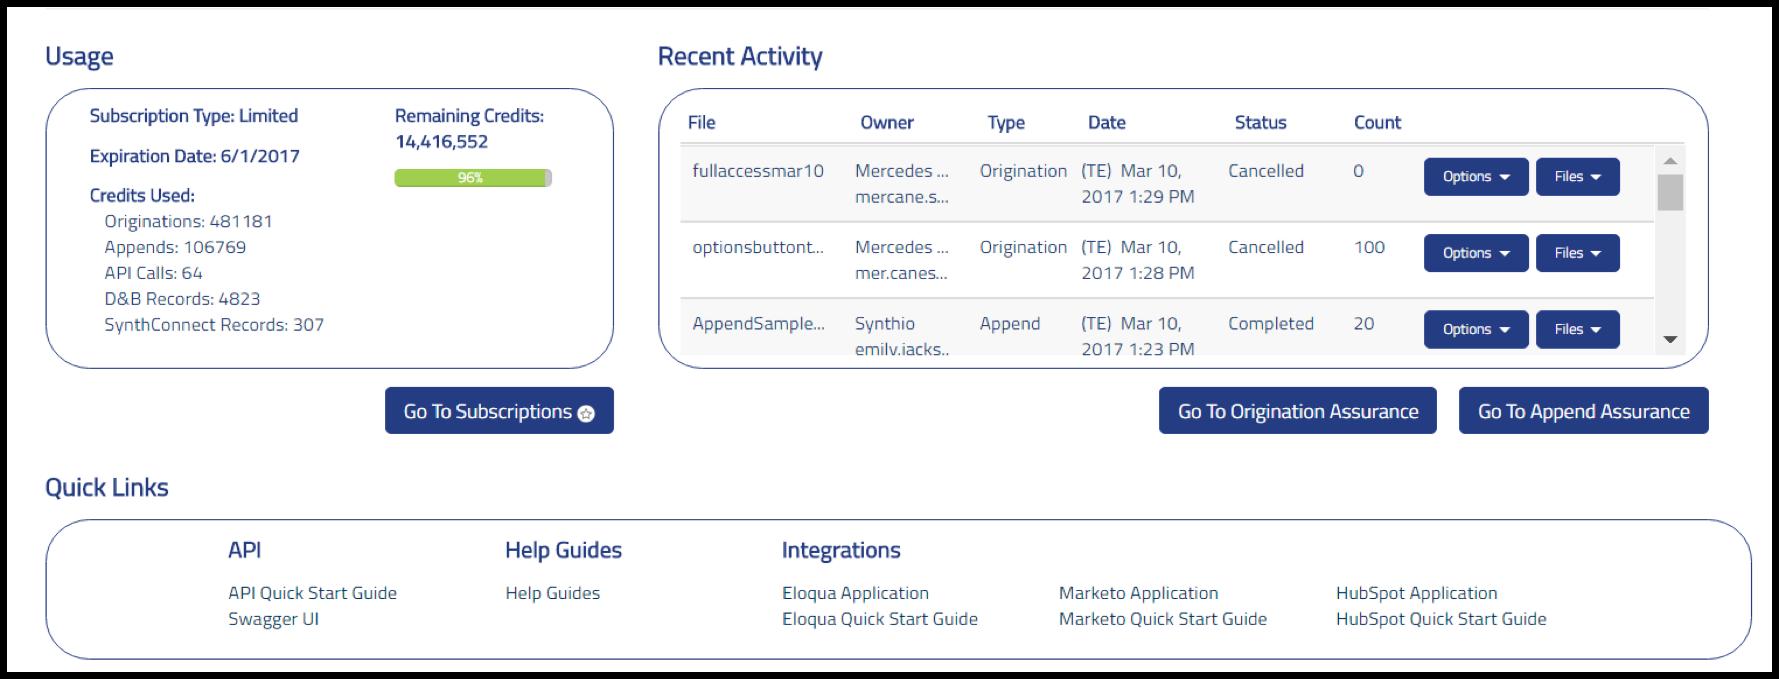 Usage activity links